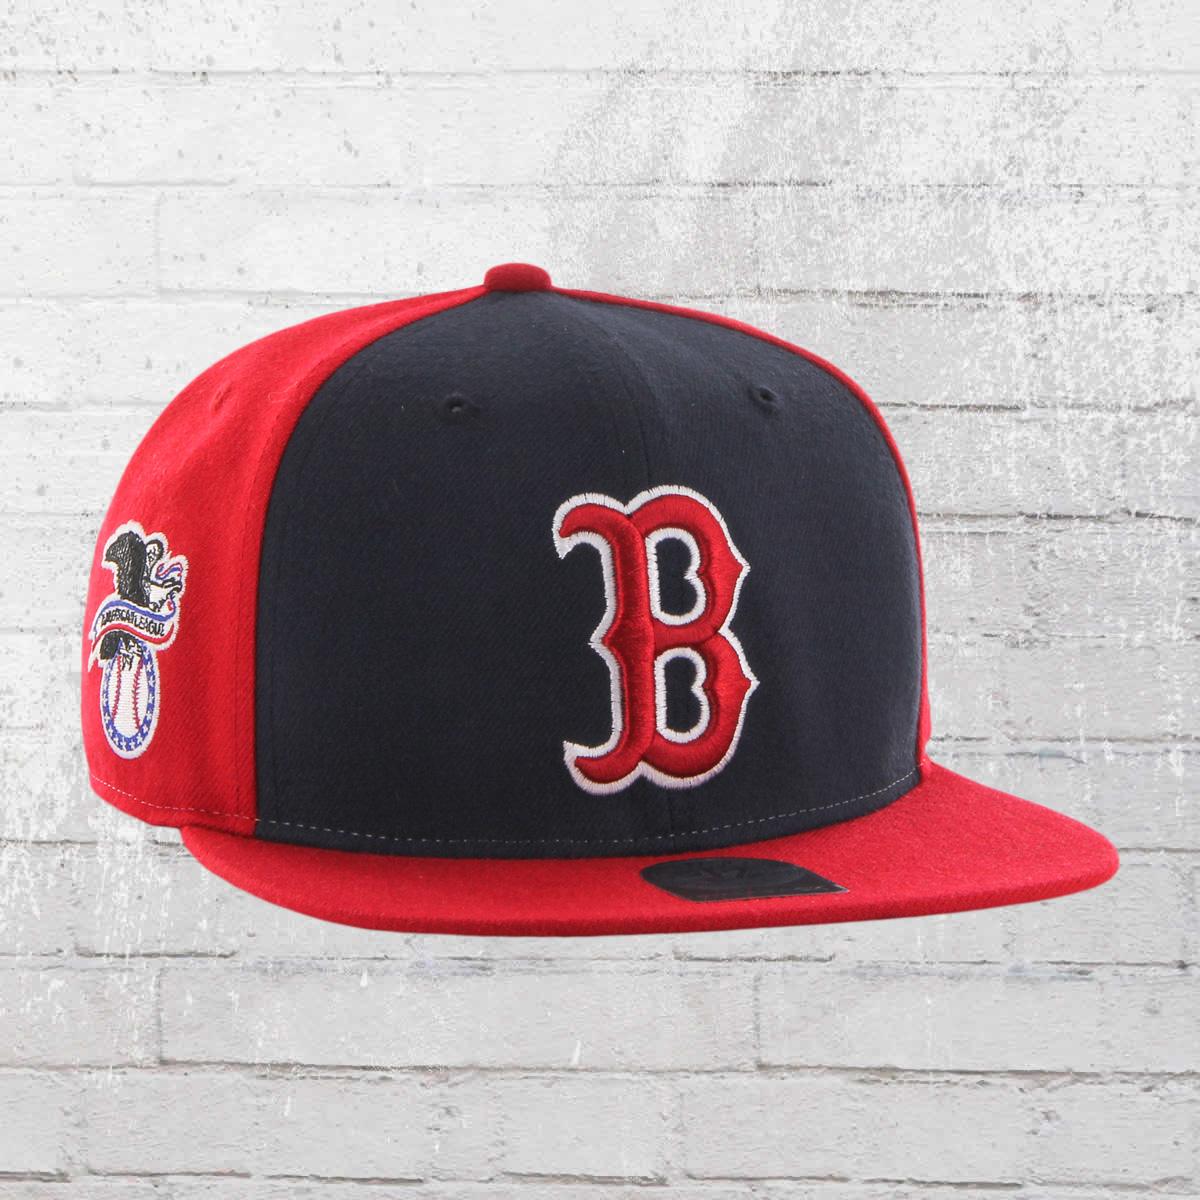 b81154cb187c64 closeout boston red sox trucker hat history 81bf1 1cca9